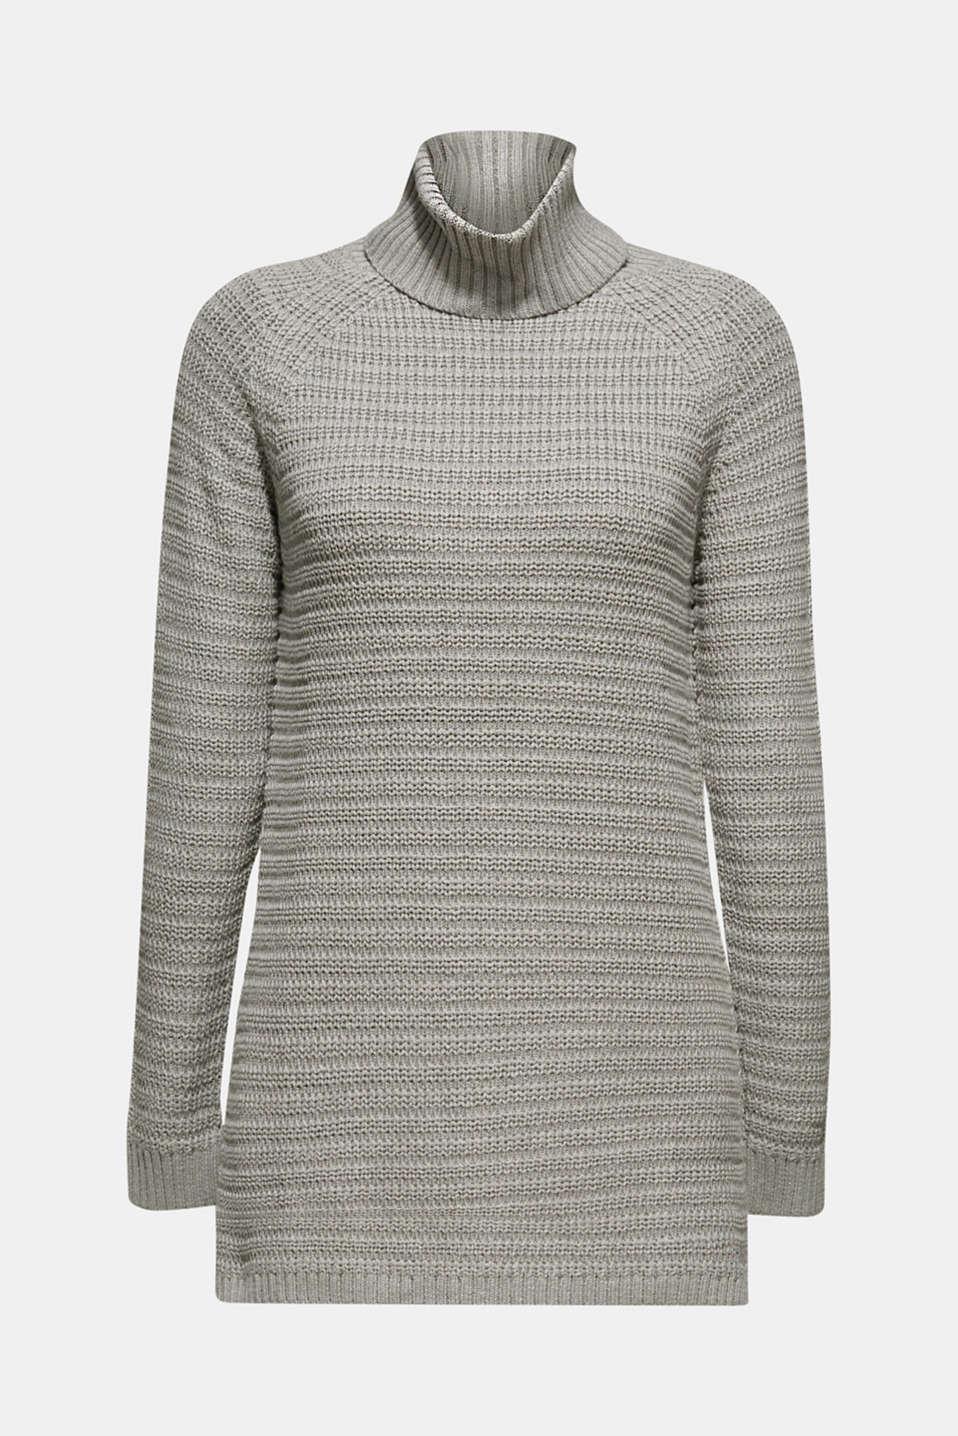 Textured polo neck jumper, MEDIUM GREY 5, detail image number 6